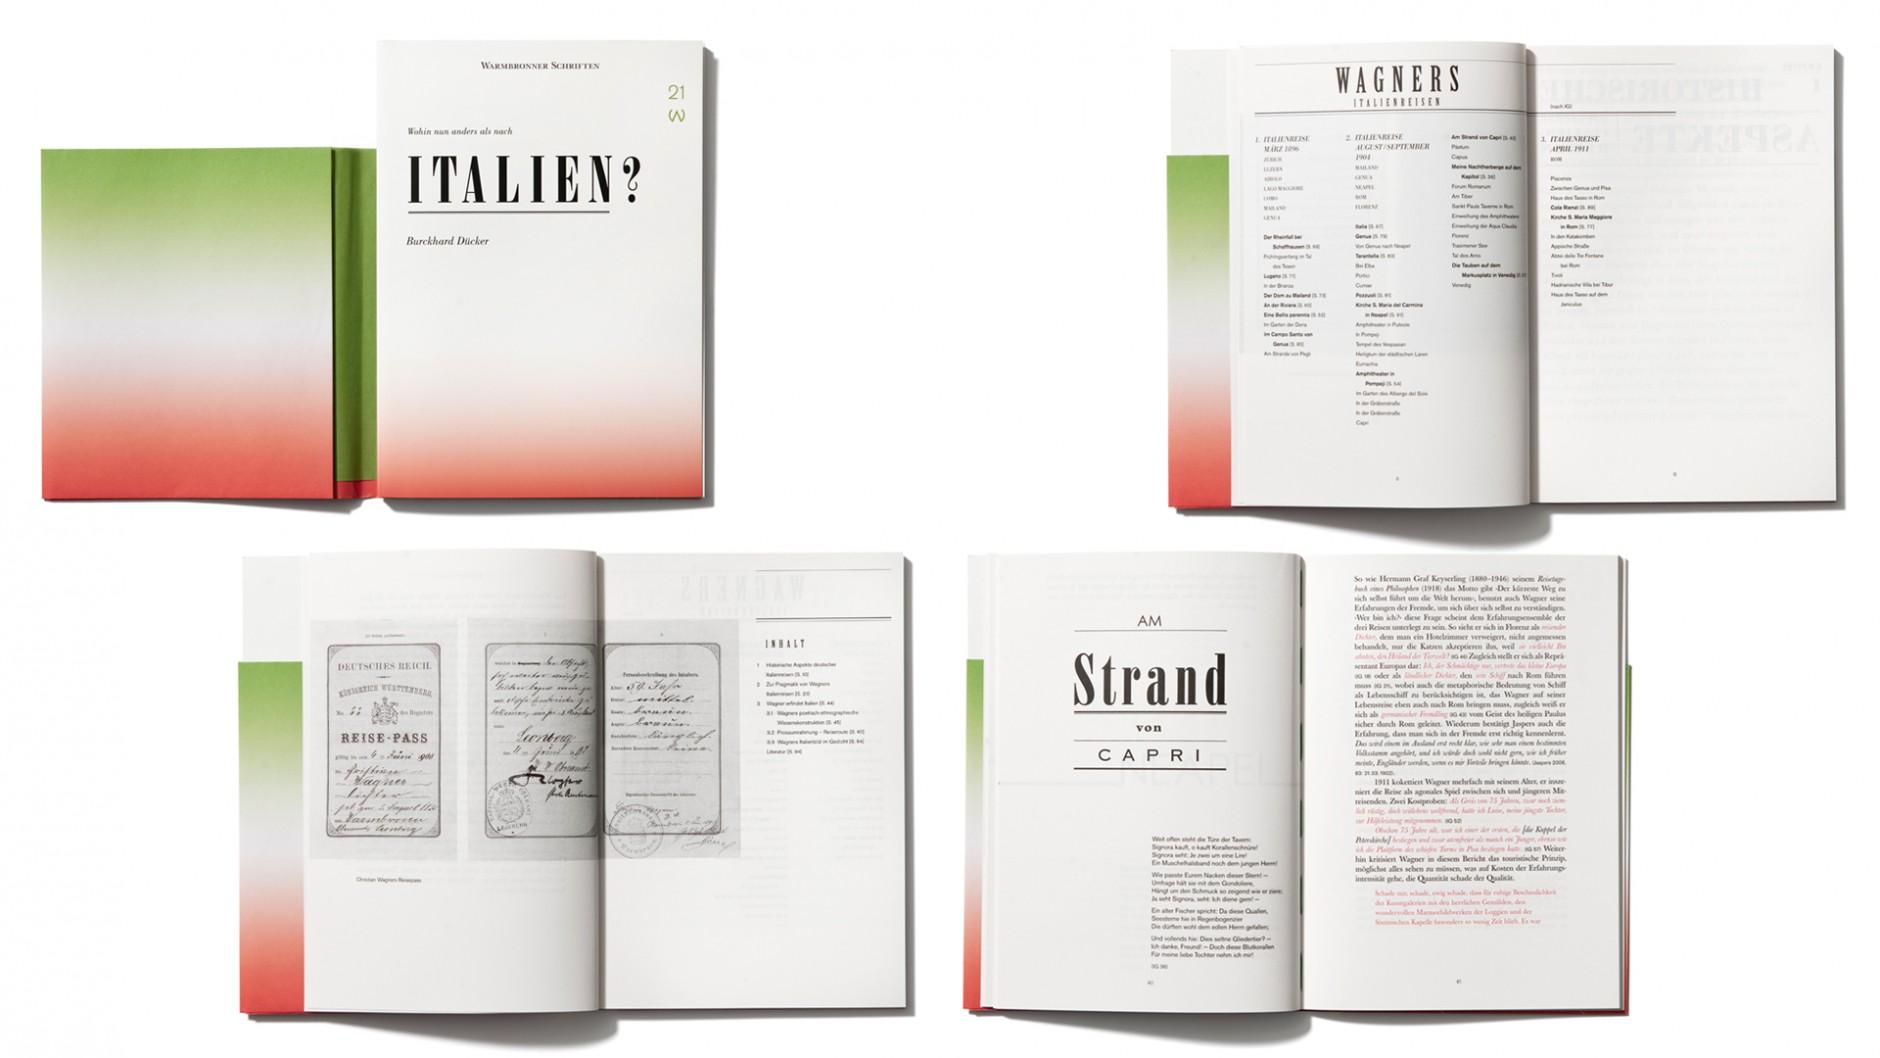 Kategorie Graphic Fine Arts: Warmbronner Schriften Nr. 21; Kunde: Christian‐Wagner‐Gesellschaft e.V.; Einsender: design hoch drei GmbH & Co. KG